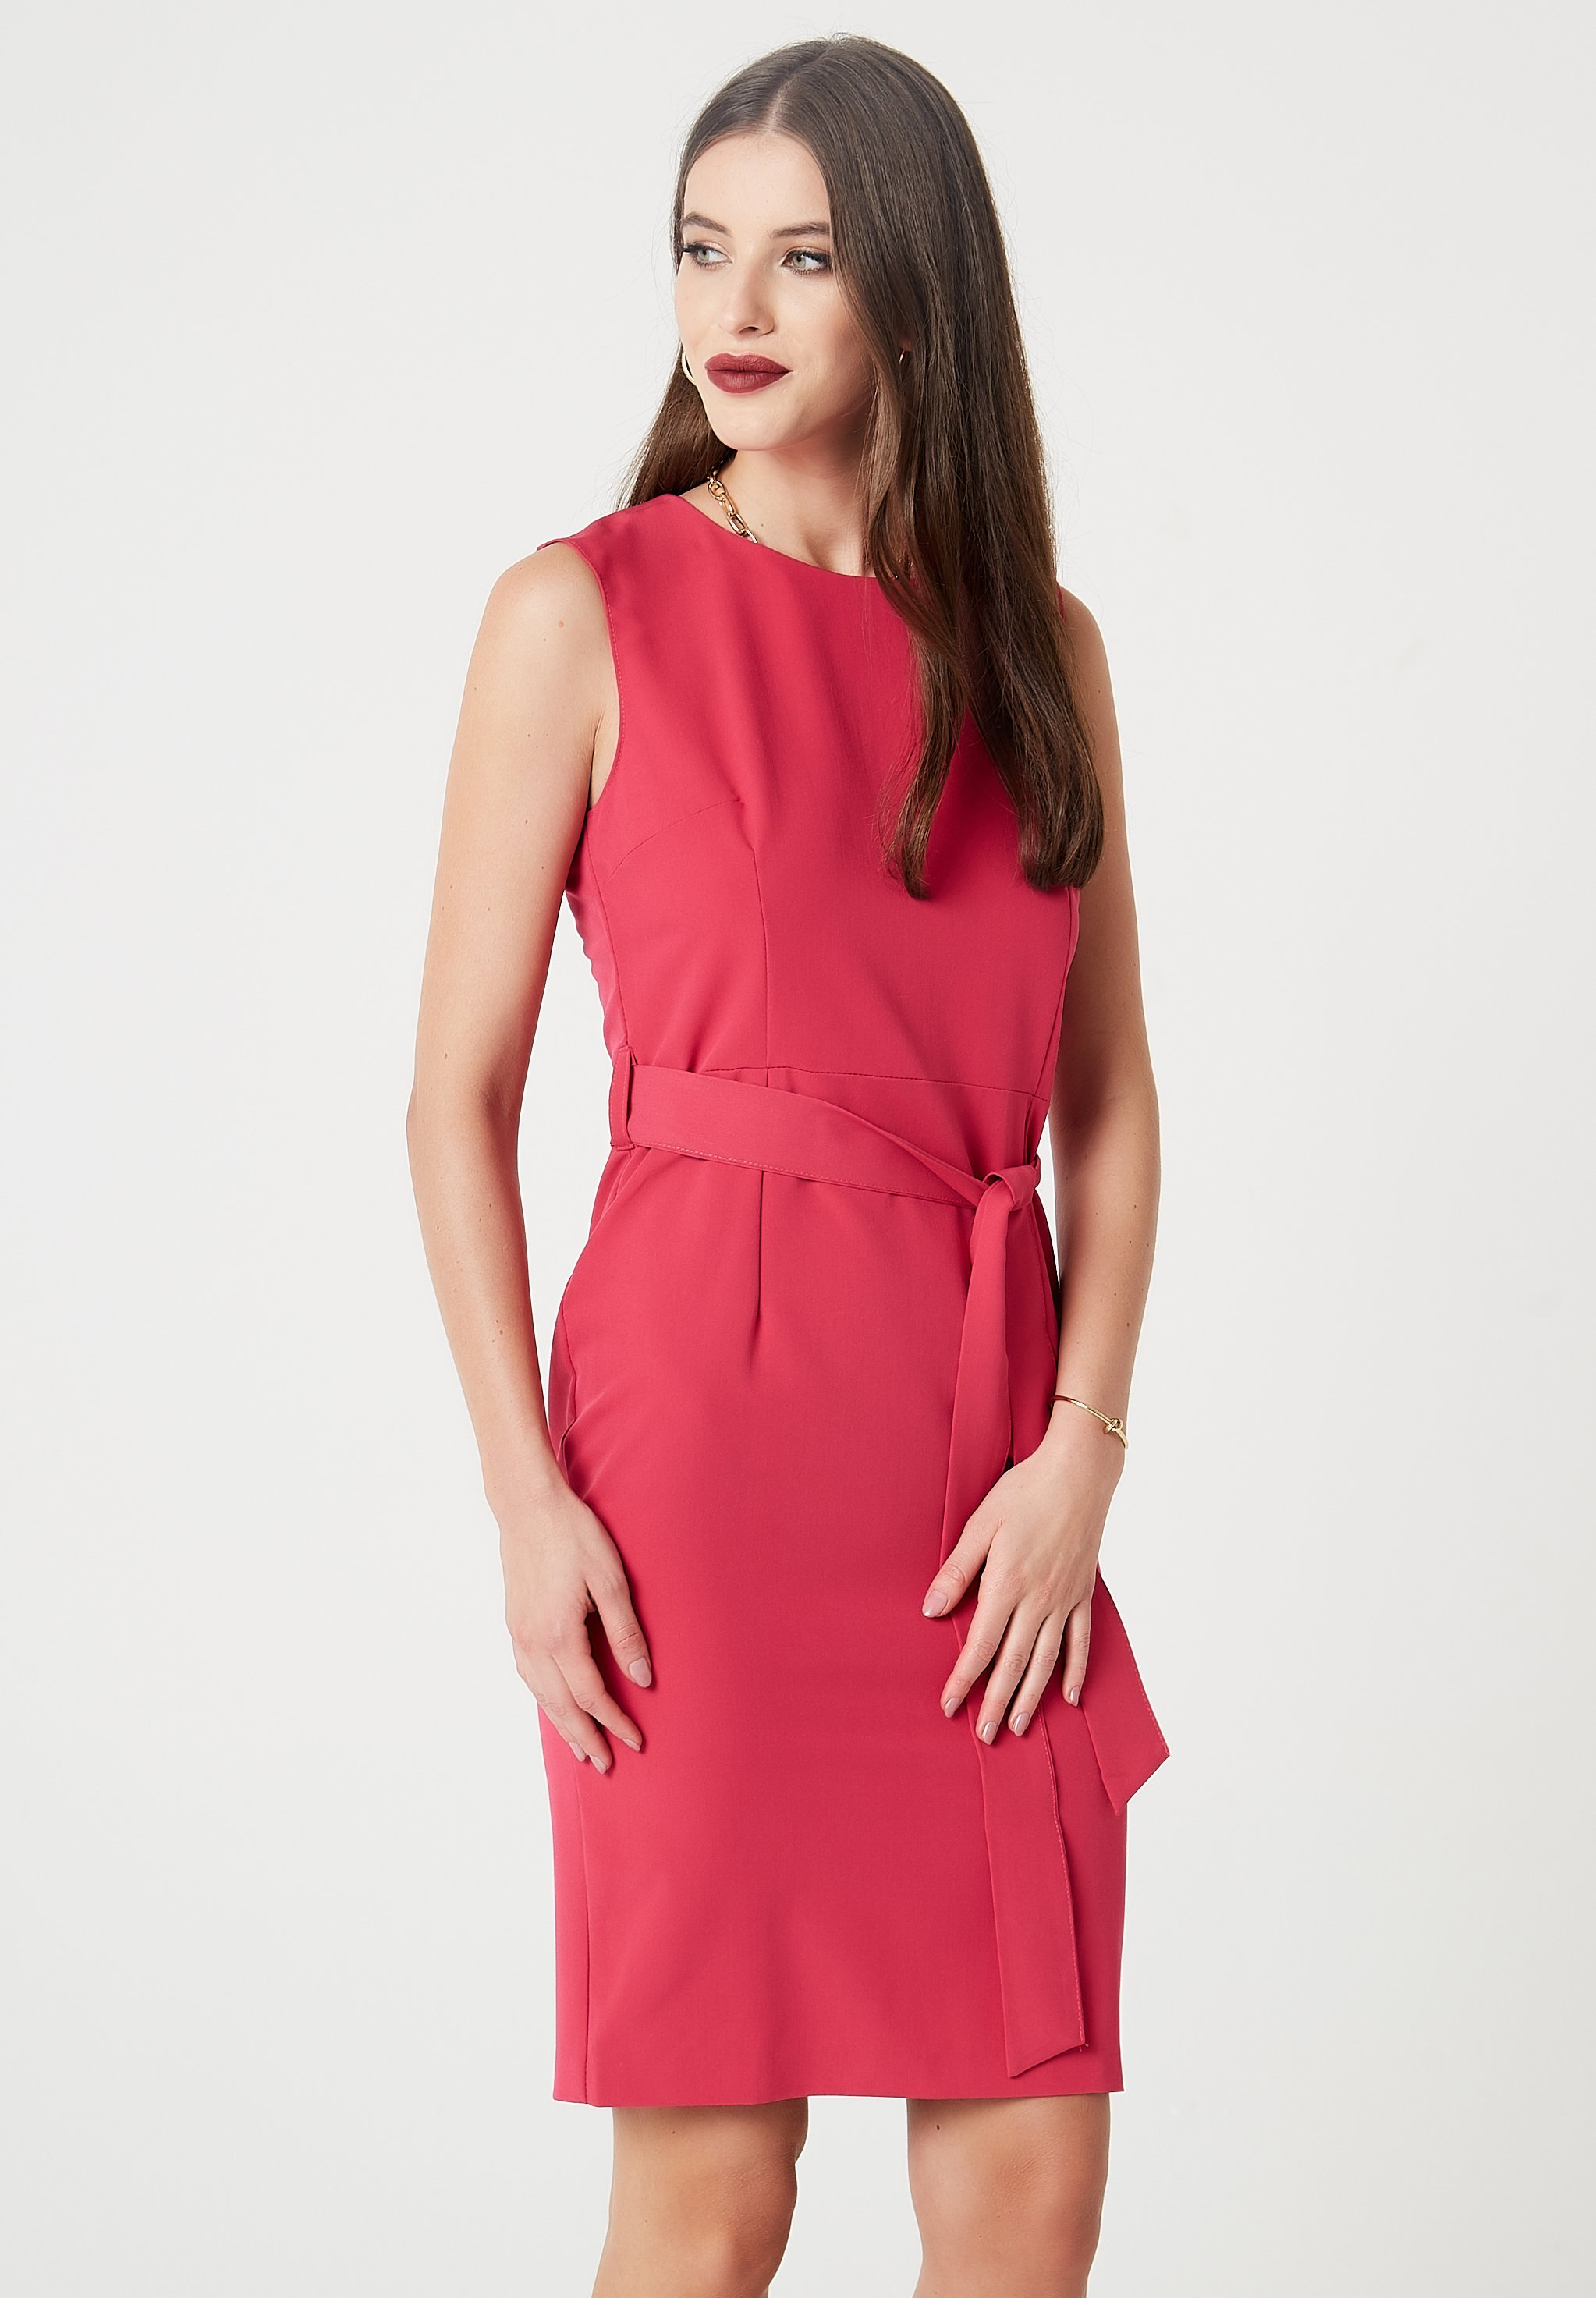 The Cheapest Women's Clothing faina Shift dress pink Tv9TUCMV7